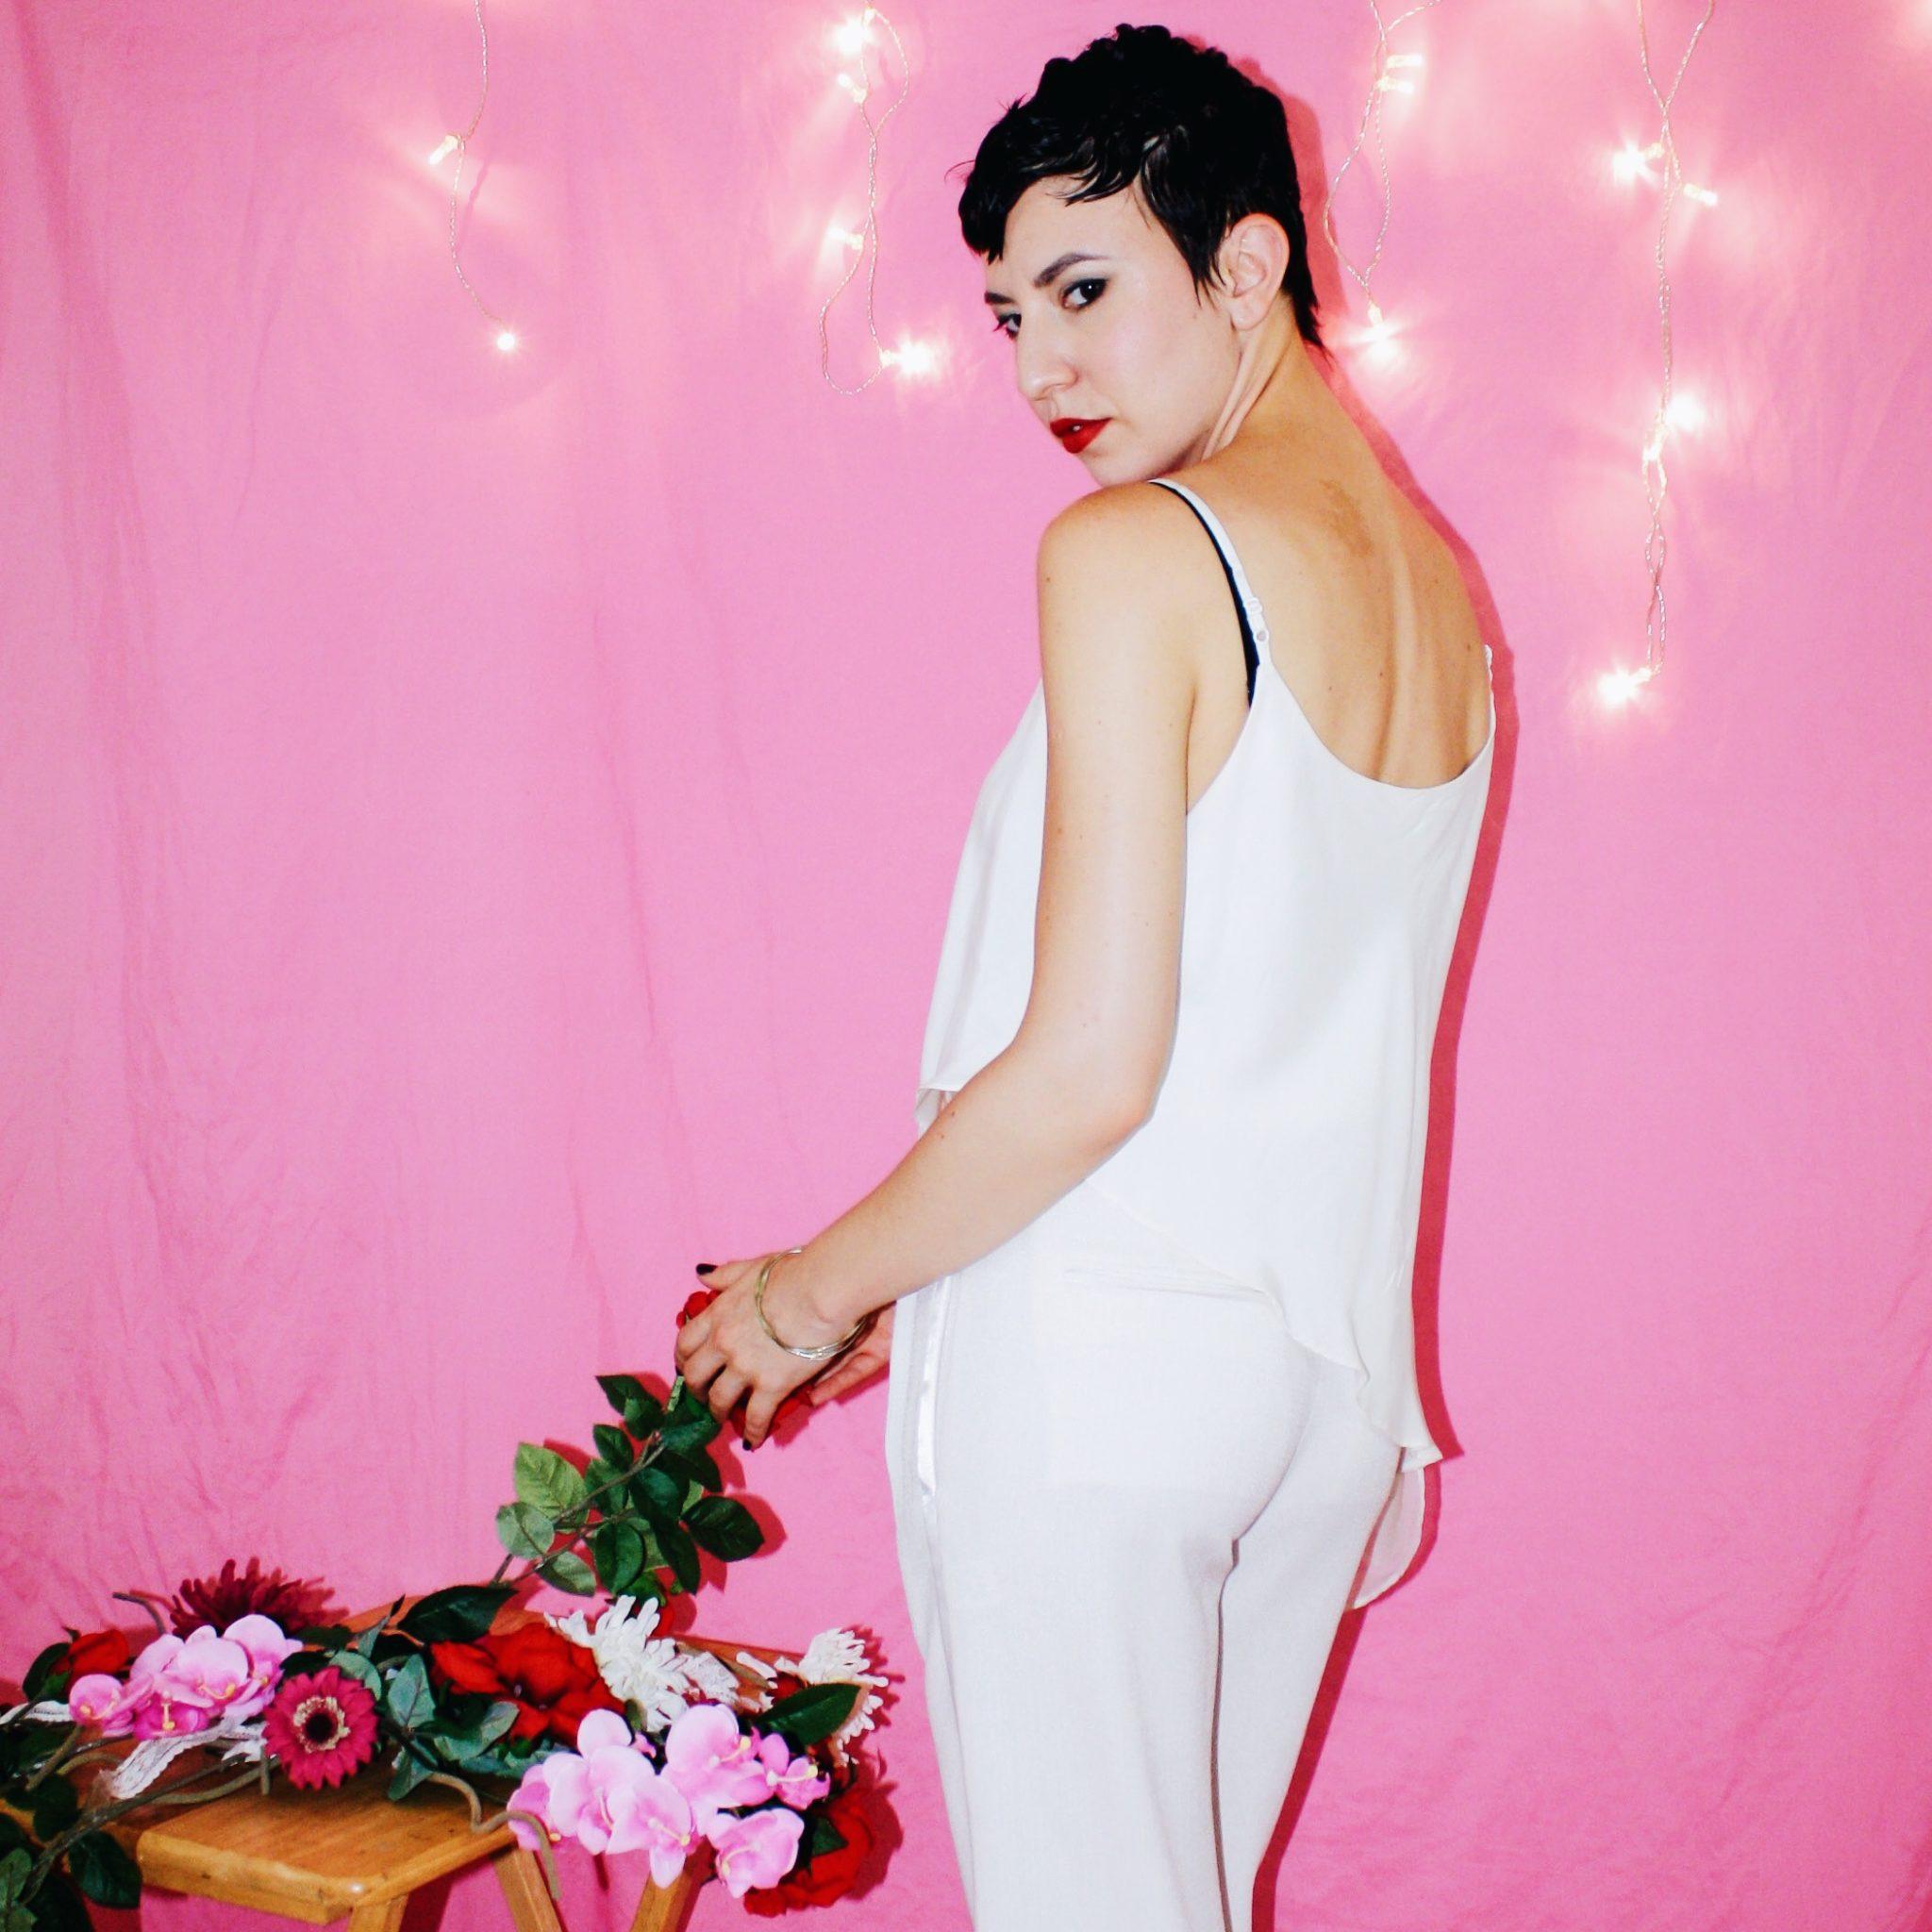 proenza schouler designer imitation white ruffle top spring summer 2018 2017 flowers pink 4